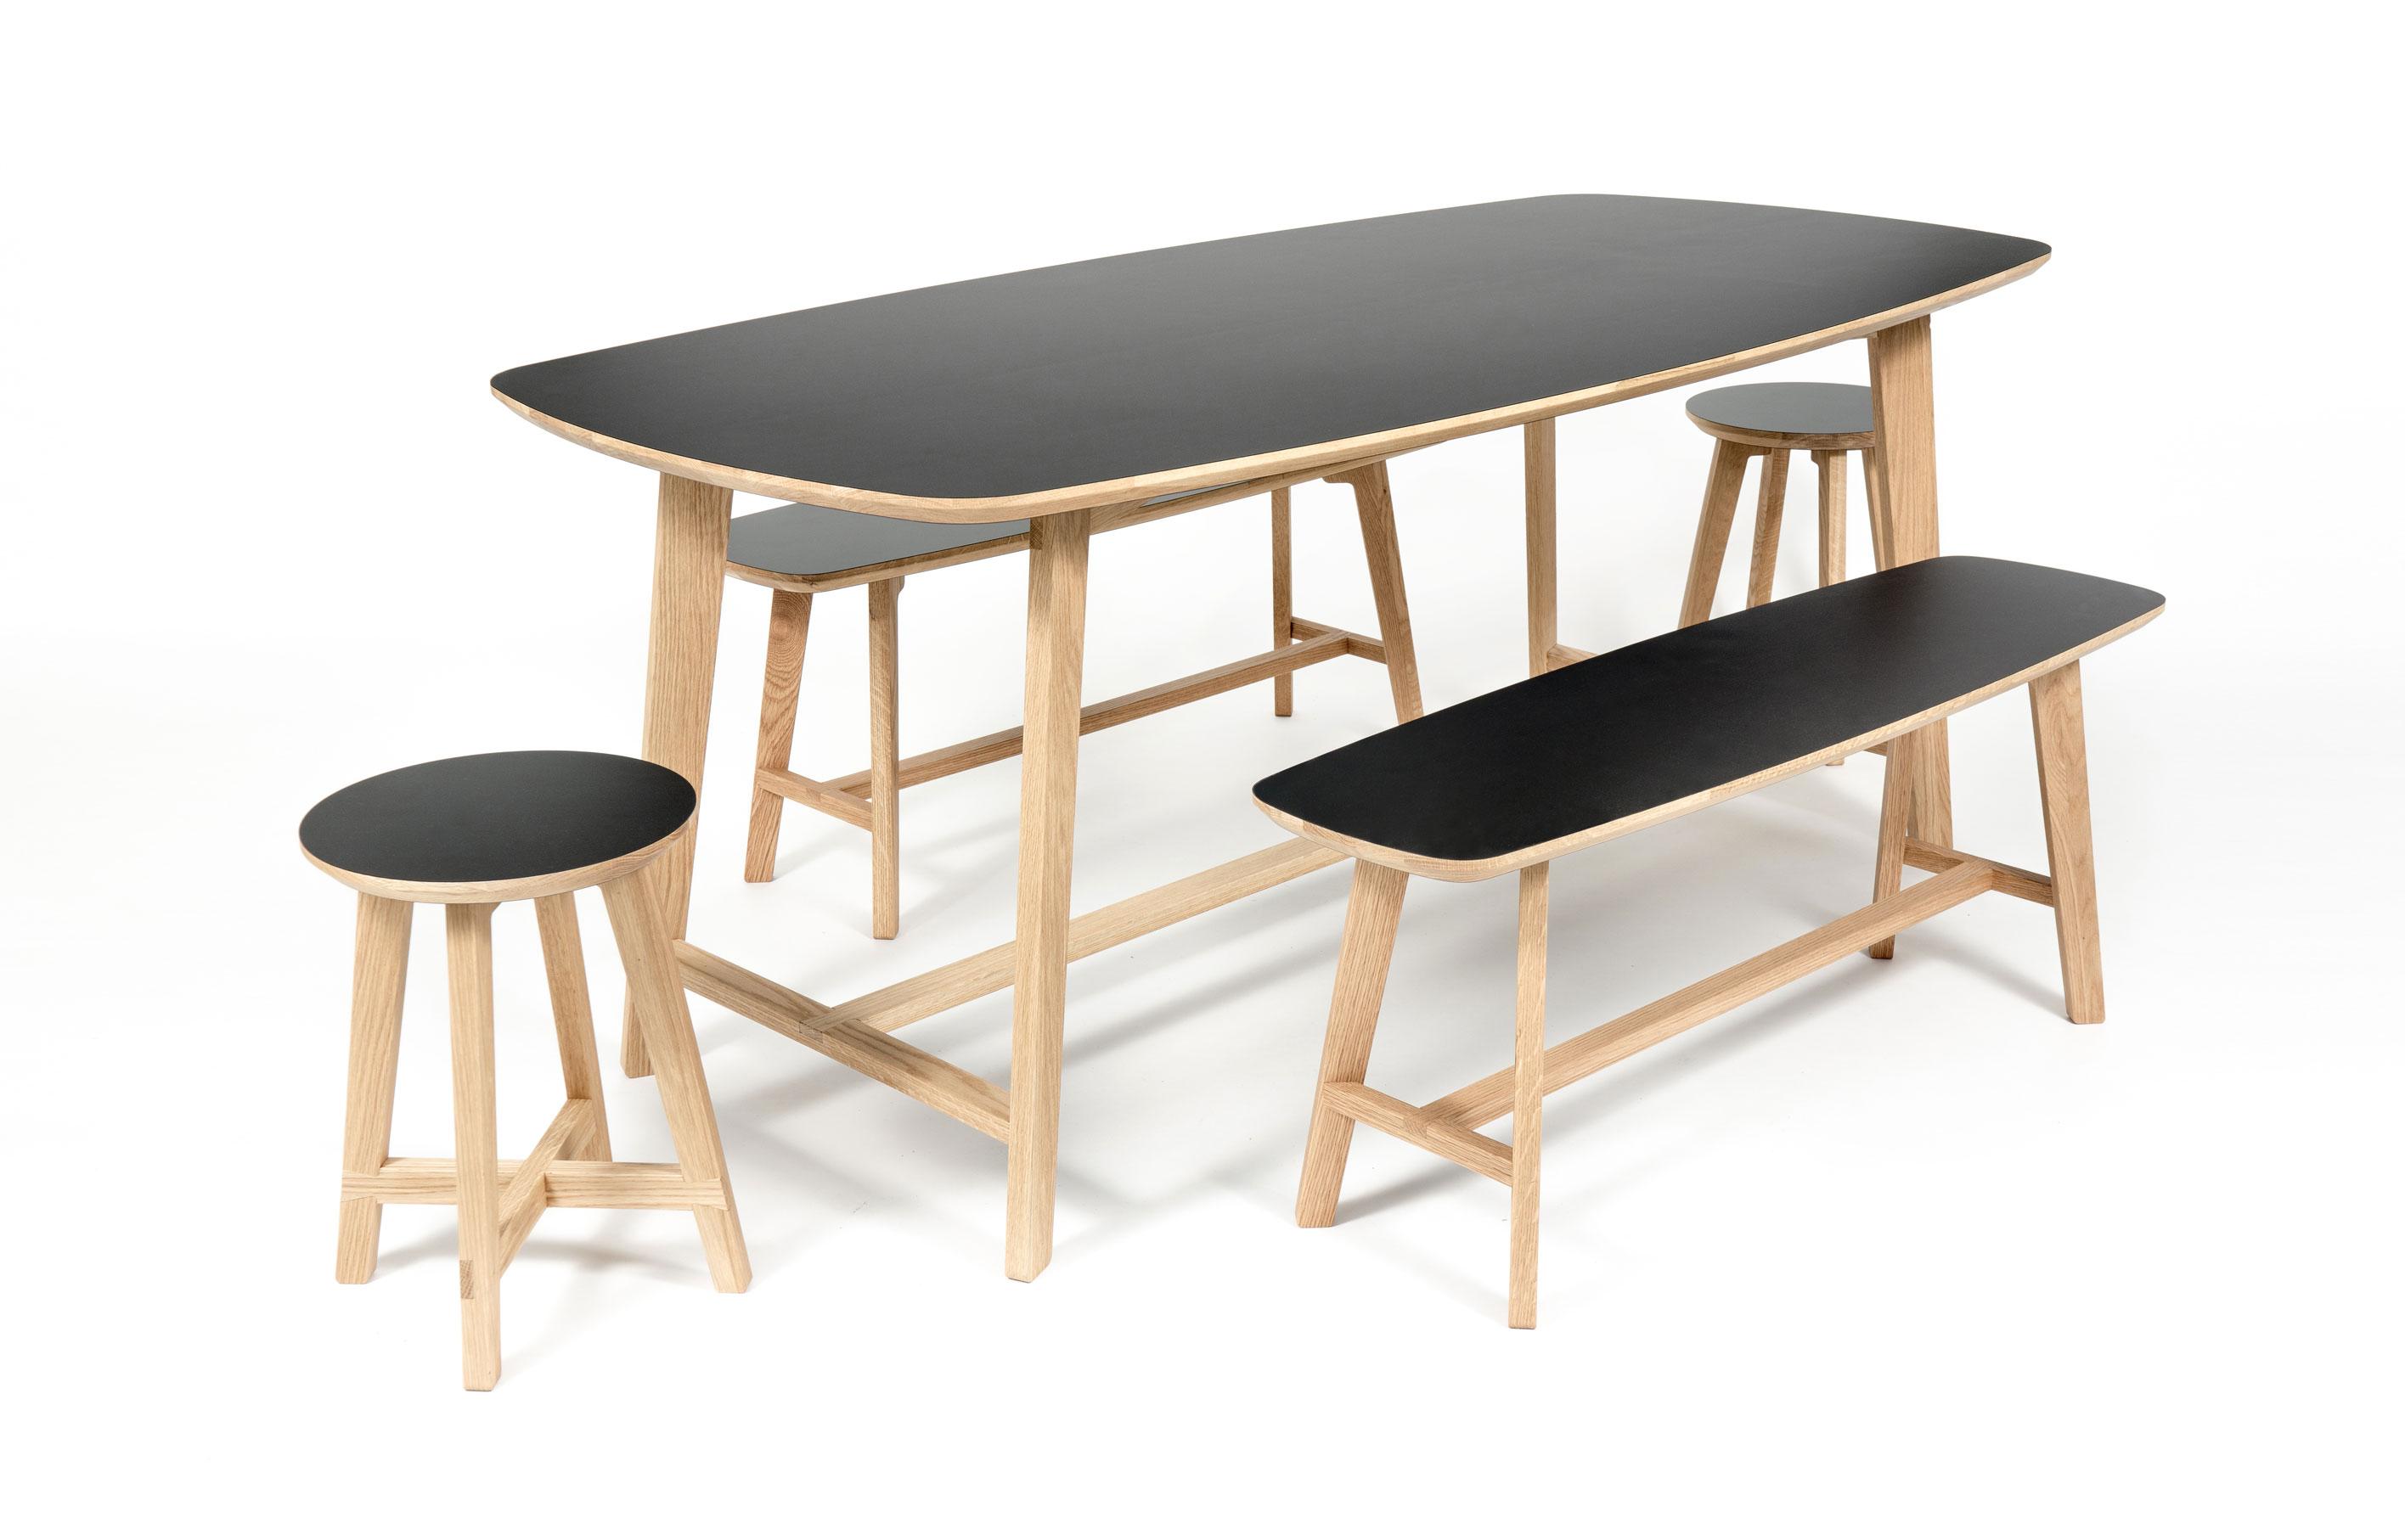 Aldworth James U0026 Bond | Makes Furniture Range